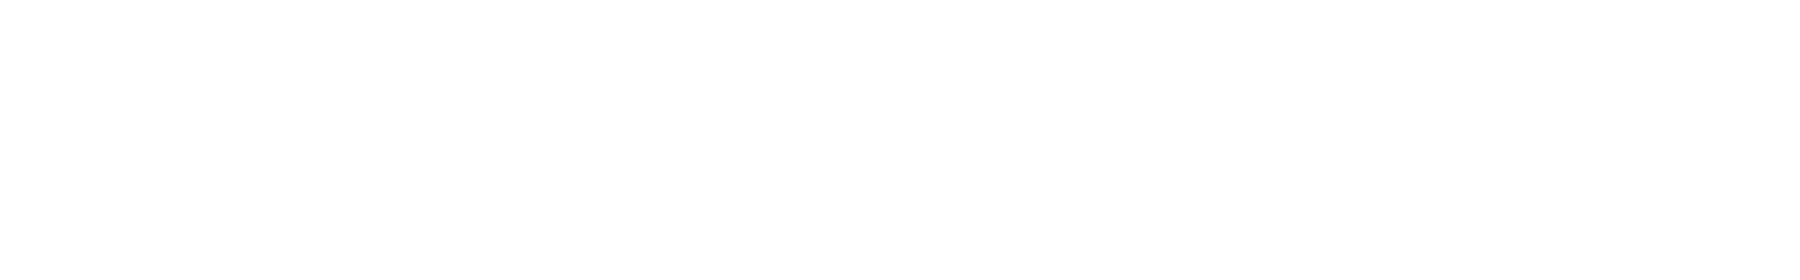 organ c7